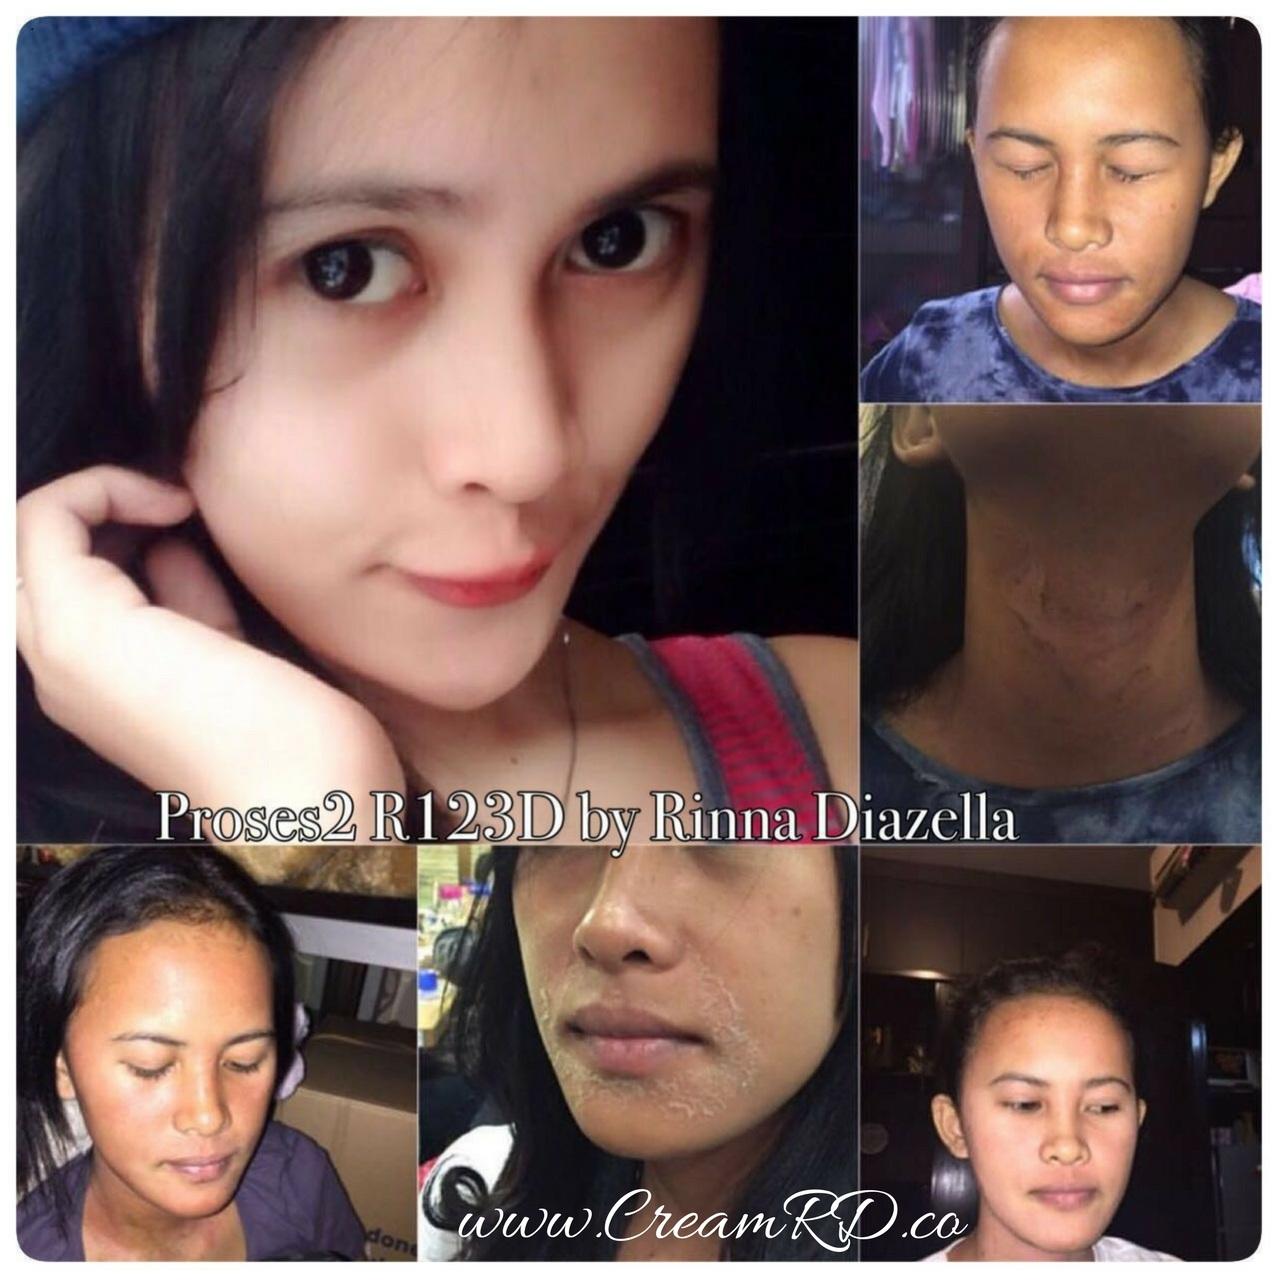 Jual Cream Rd Ori Asli 100 Distributor Rinna Diazella Skincare Testimoni Original